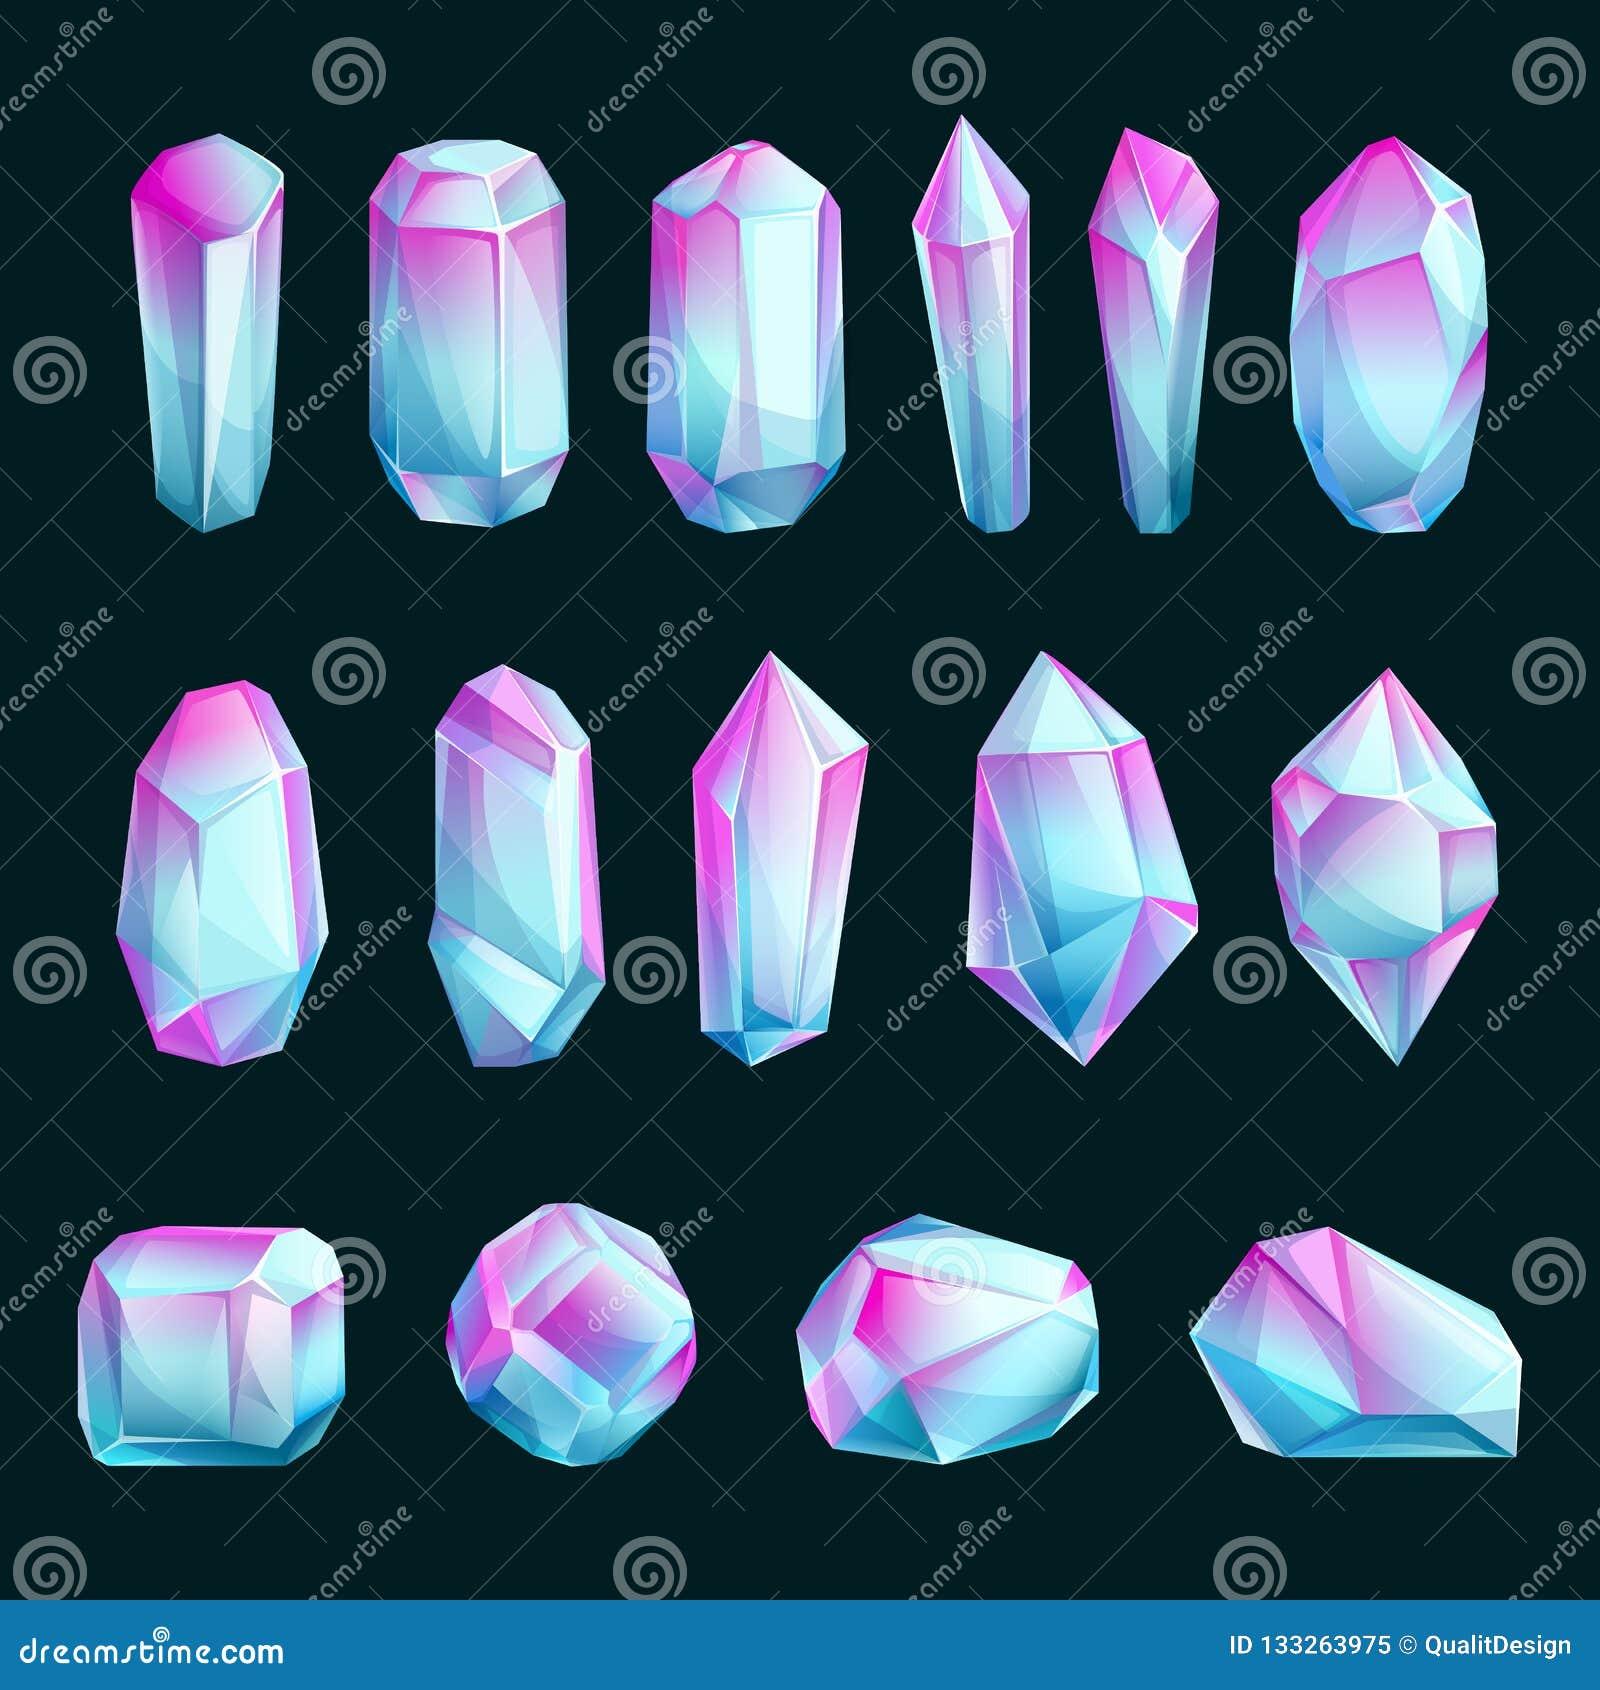 Crystals And Minerals, Vector Cartoon Illustration  Set Of